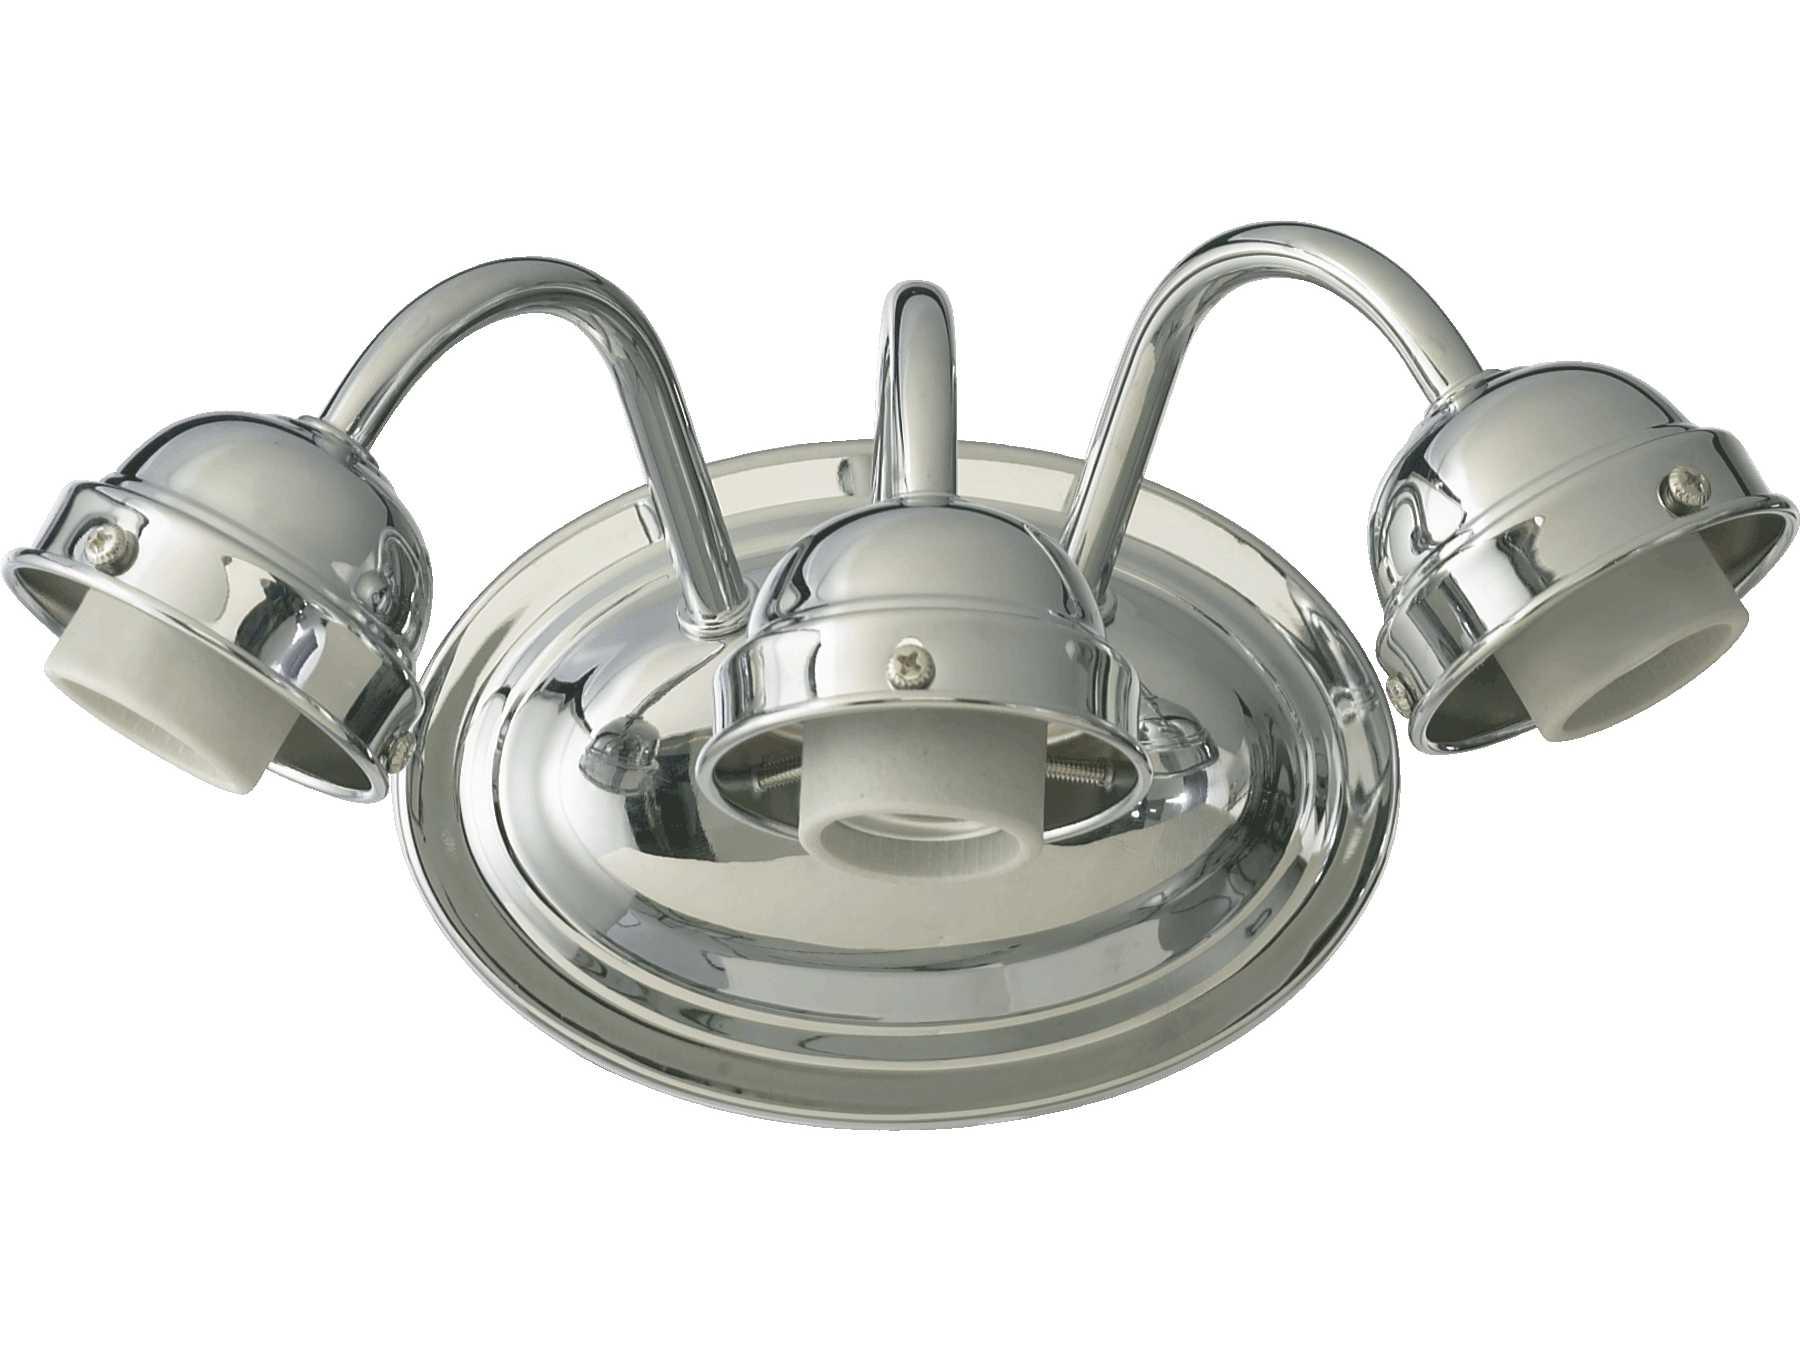 Quorum Vanity Lights : Quorum International Chrome Three-Lights Vanity Light 5403-3-014